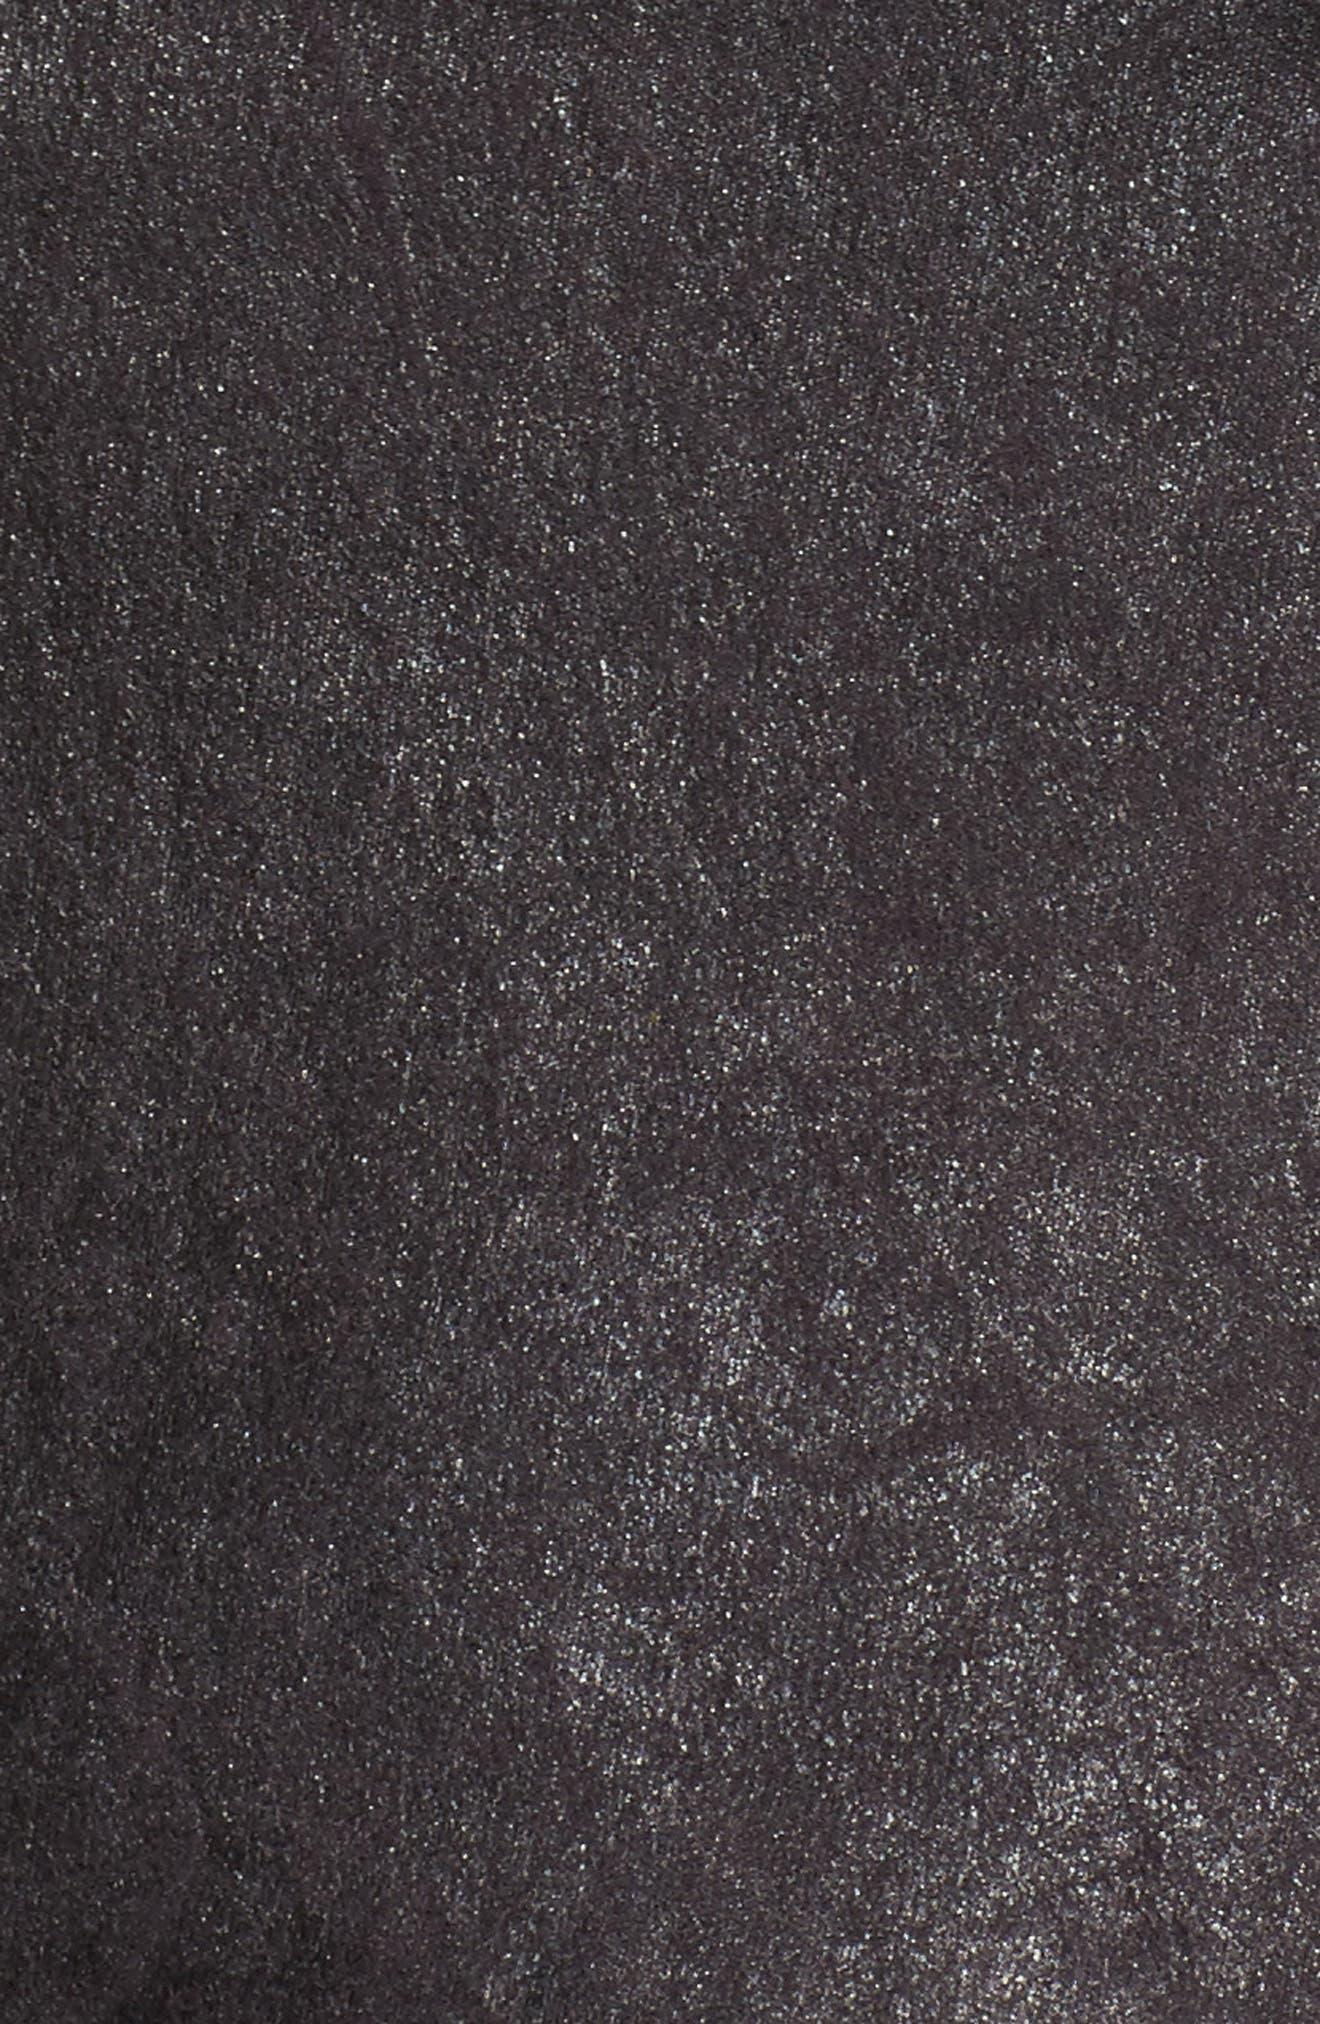 Asymmetrical Faux Leather Jacket,                             Alternate thumbnail 6, color,                             001